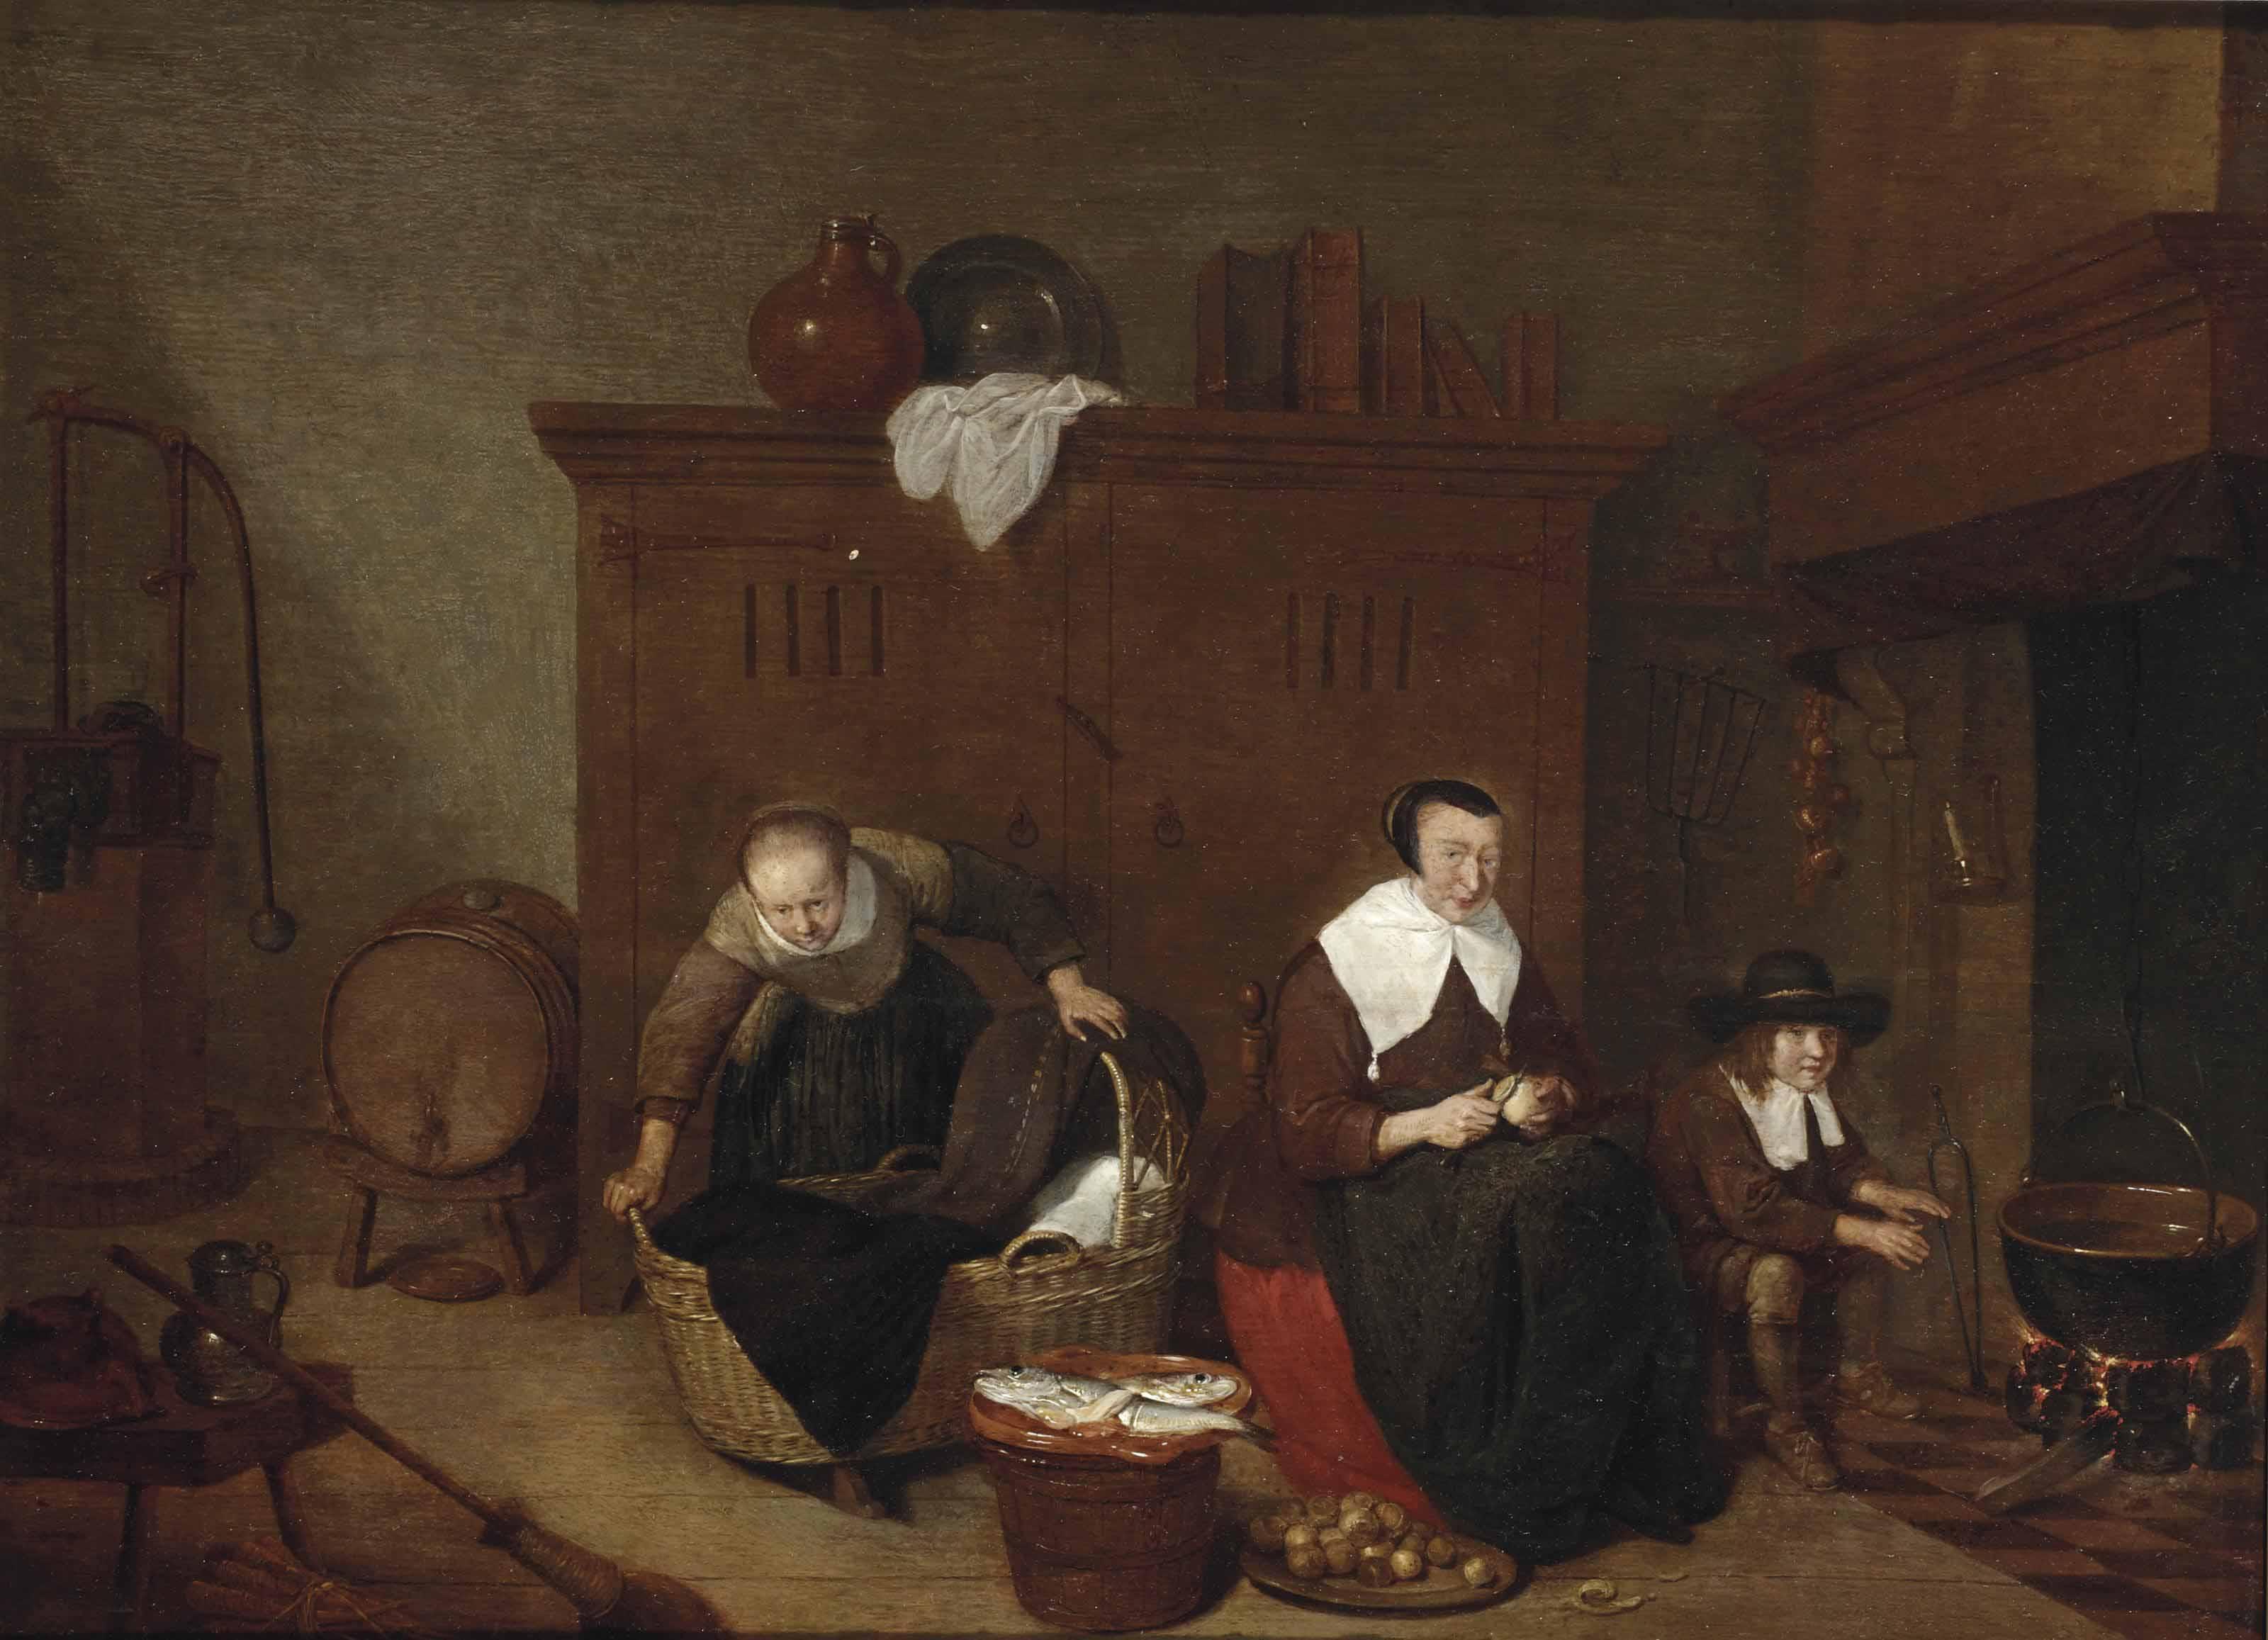 Kitchen Art Leiden.Quiringh Gerritsz Van Brekelenkam Zwammerdam 1622 30 1669 79